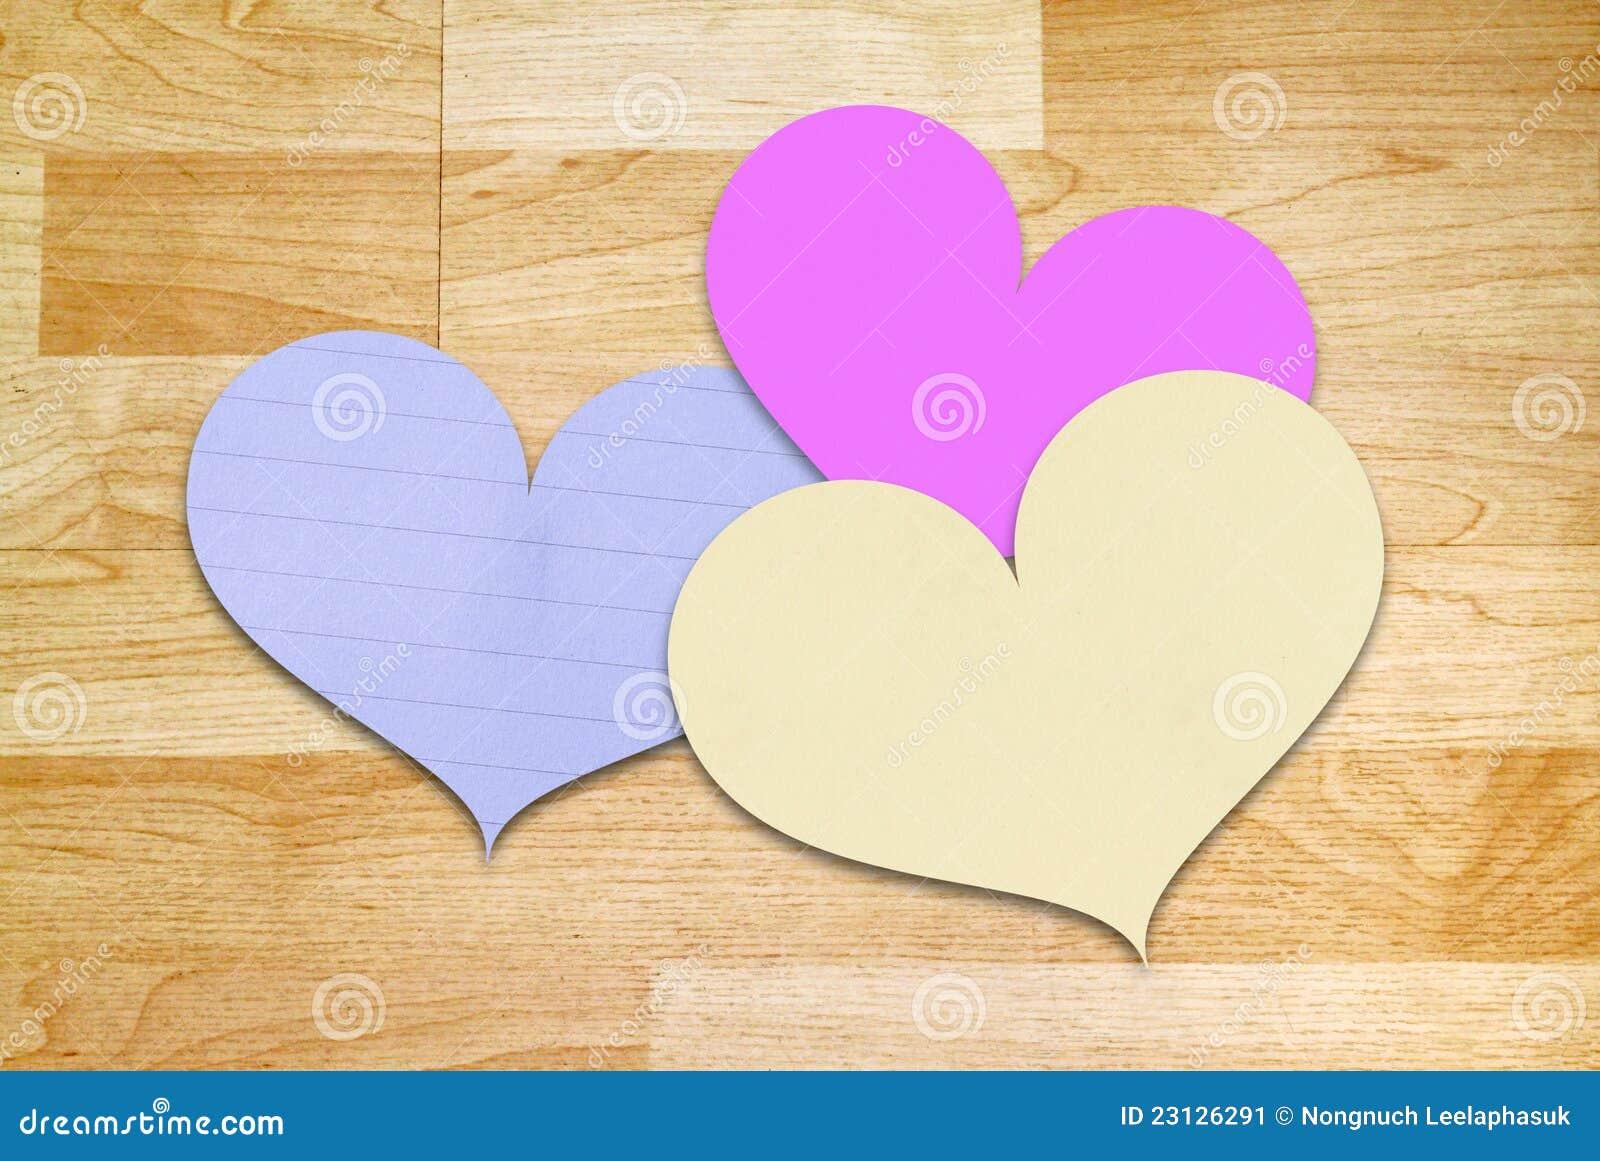 diy idea: heart-shaped paper clips